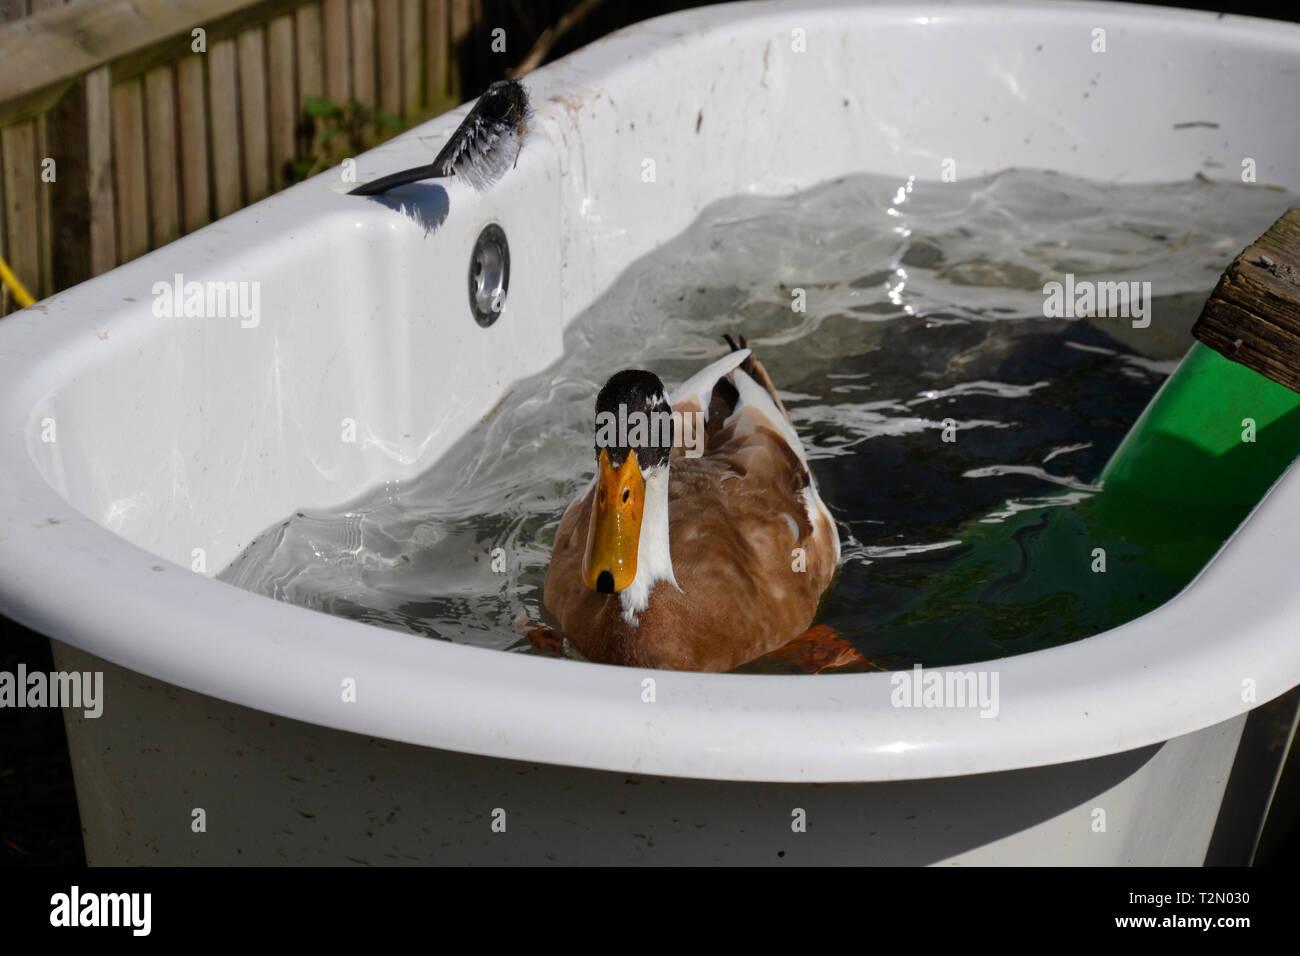 Indian runner duck in the bath at the Bucks Goat Centre, Stoke Mandeville, Aylesbury, Buckinghamshire, UK - Stock Image